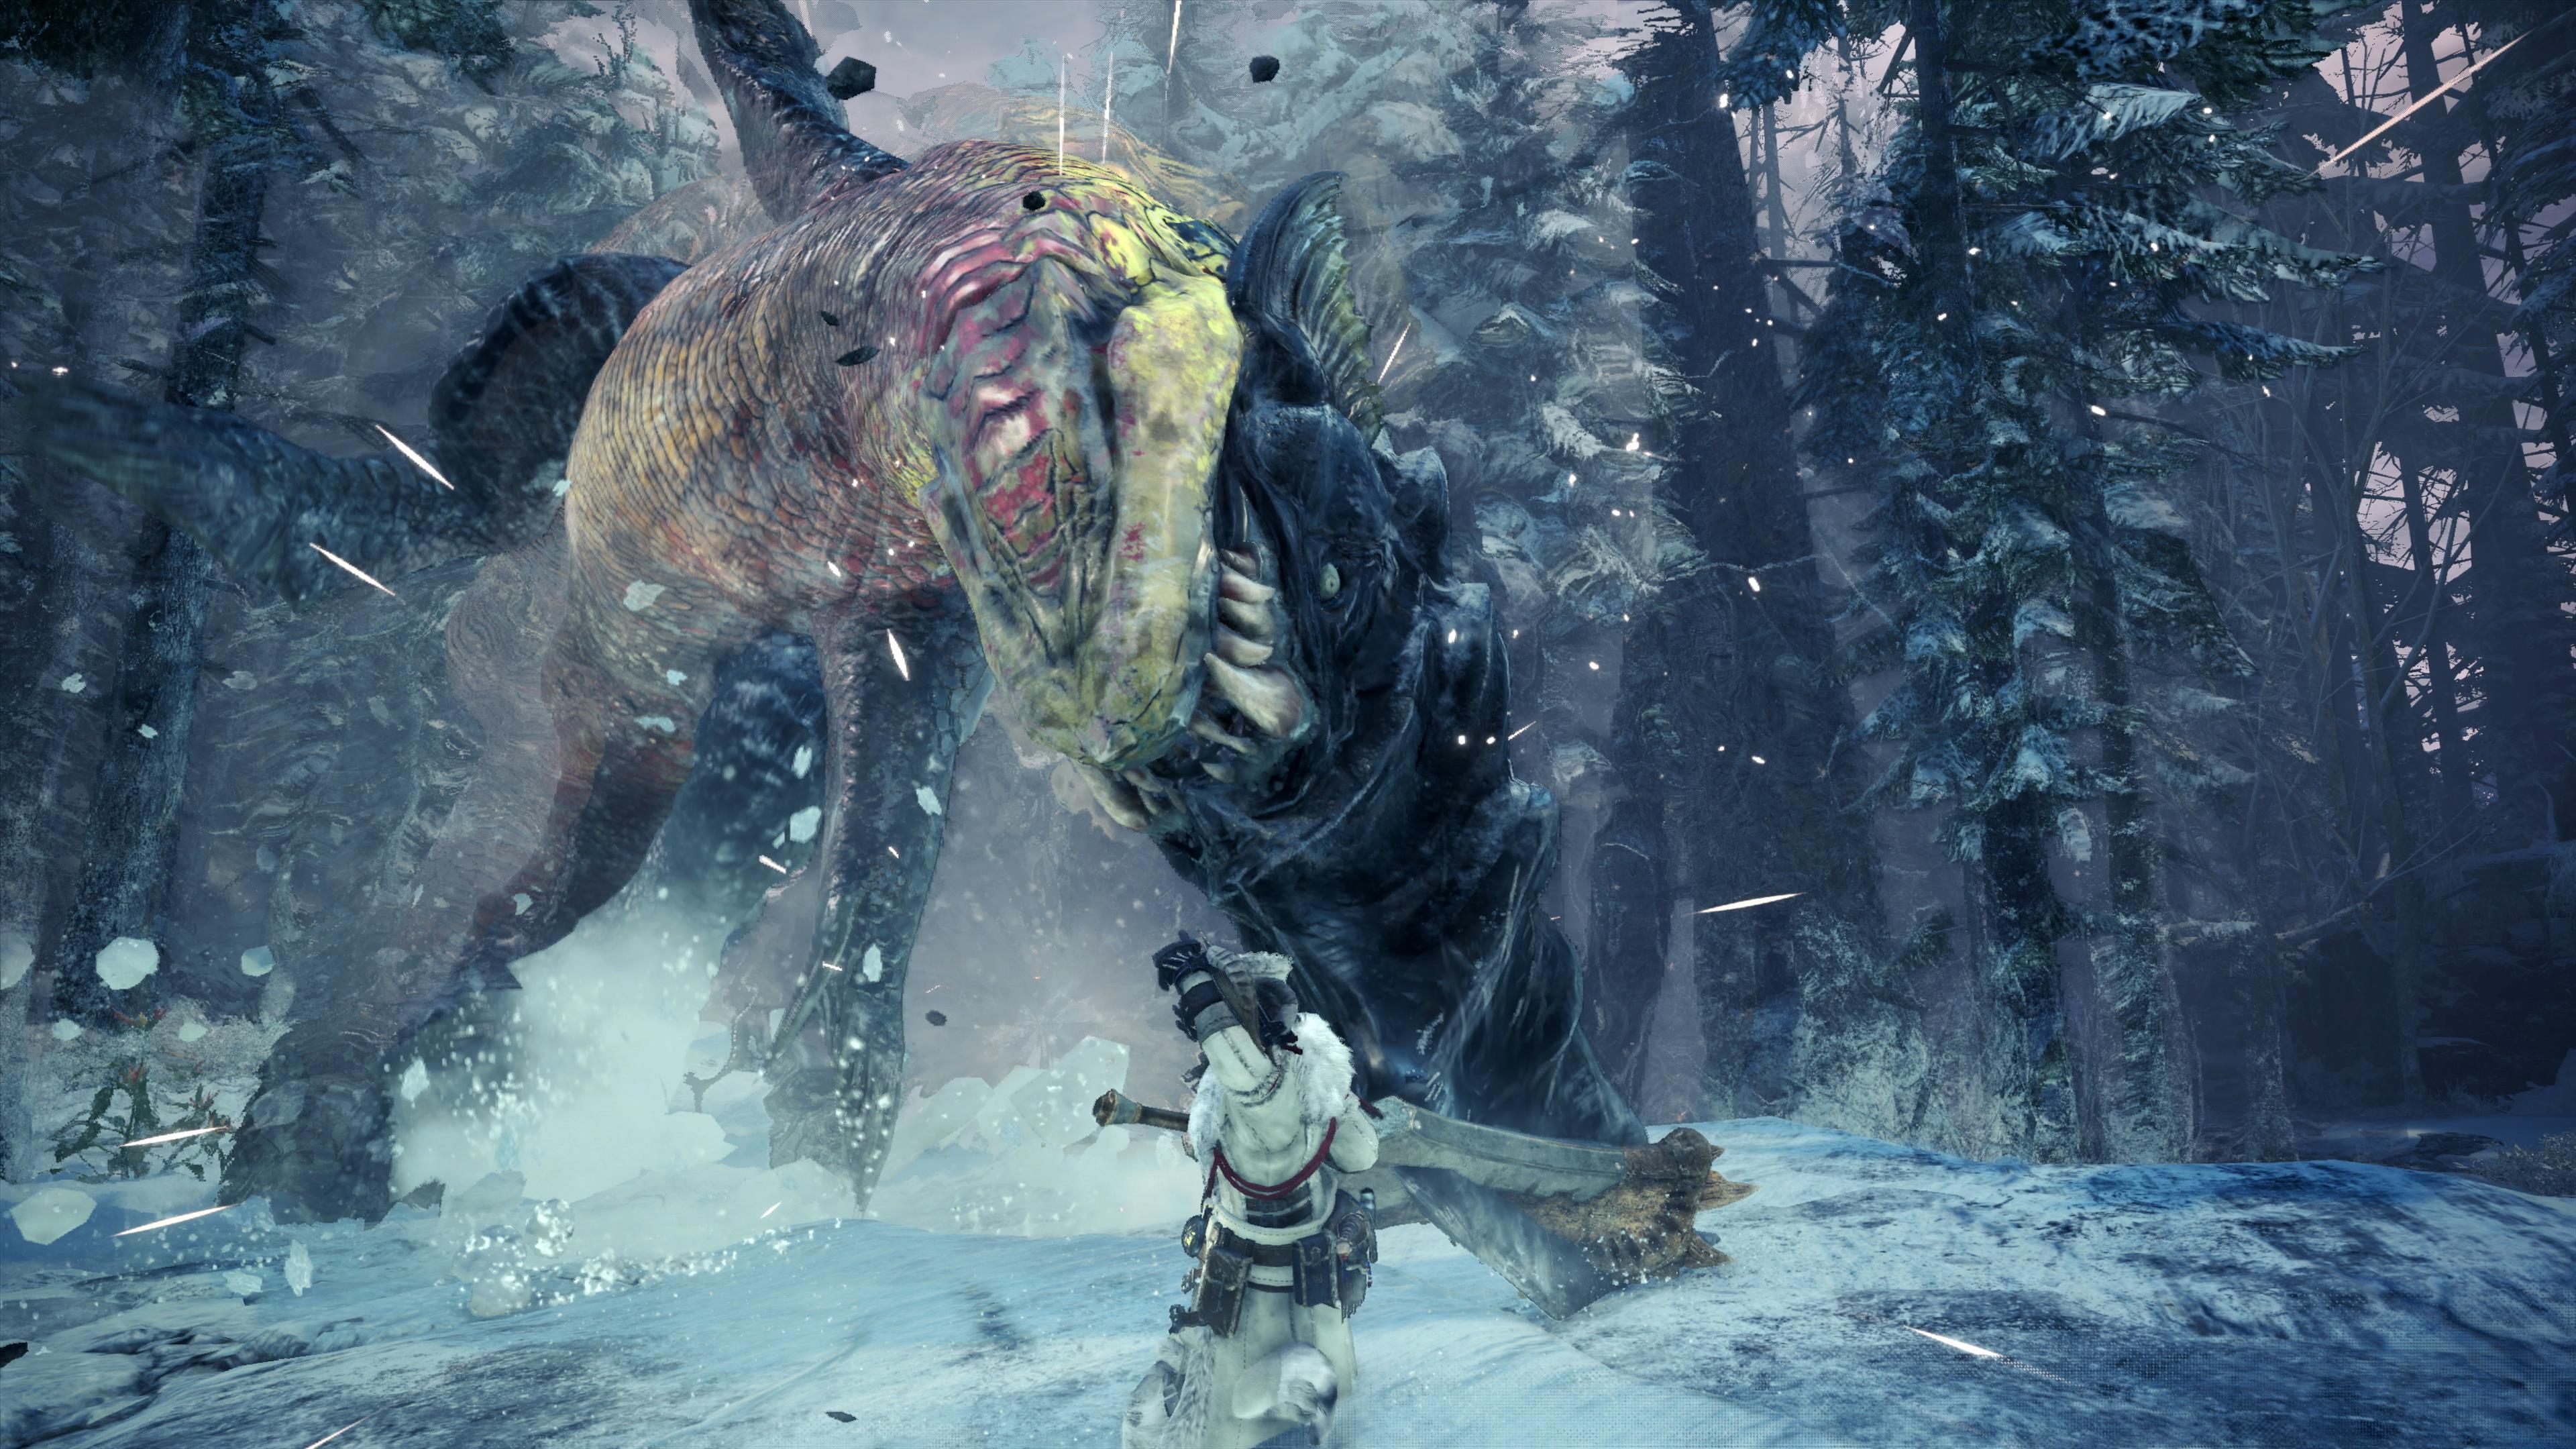 Image for Monster Hunter World: Iceborne has shipped over 2.8 million units